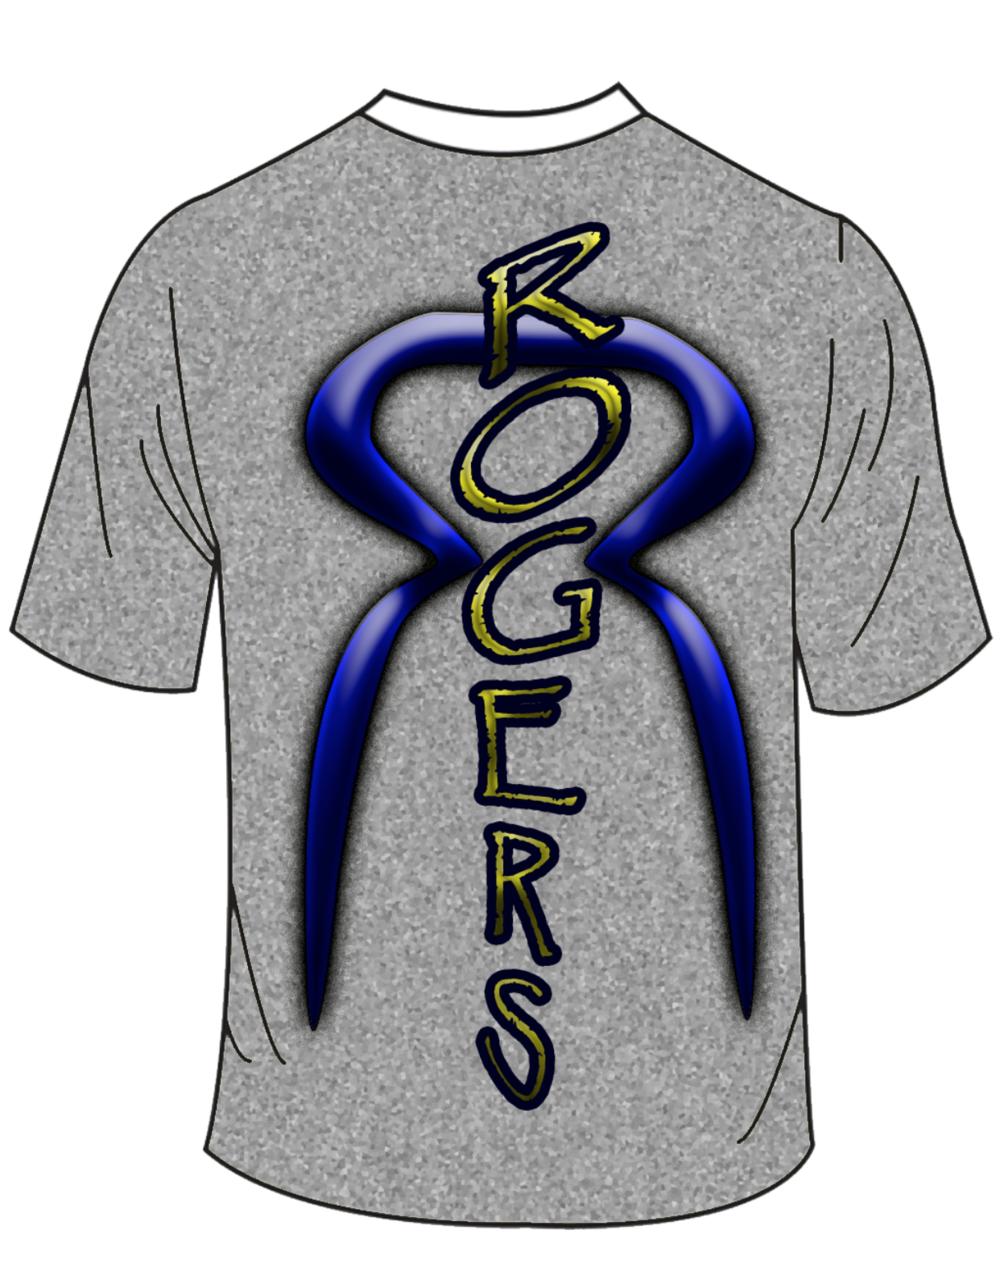 WRHS Shirt 2.png